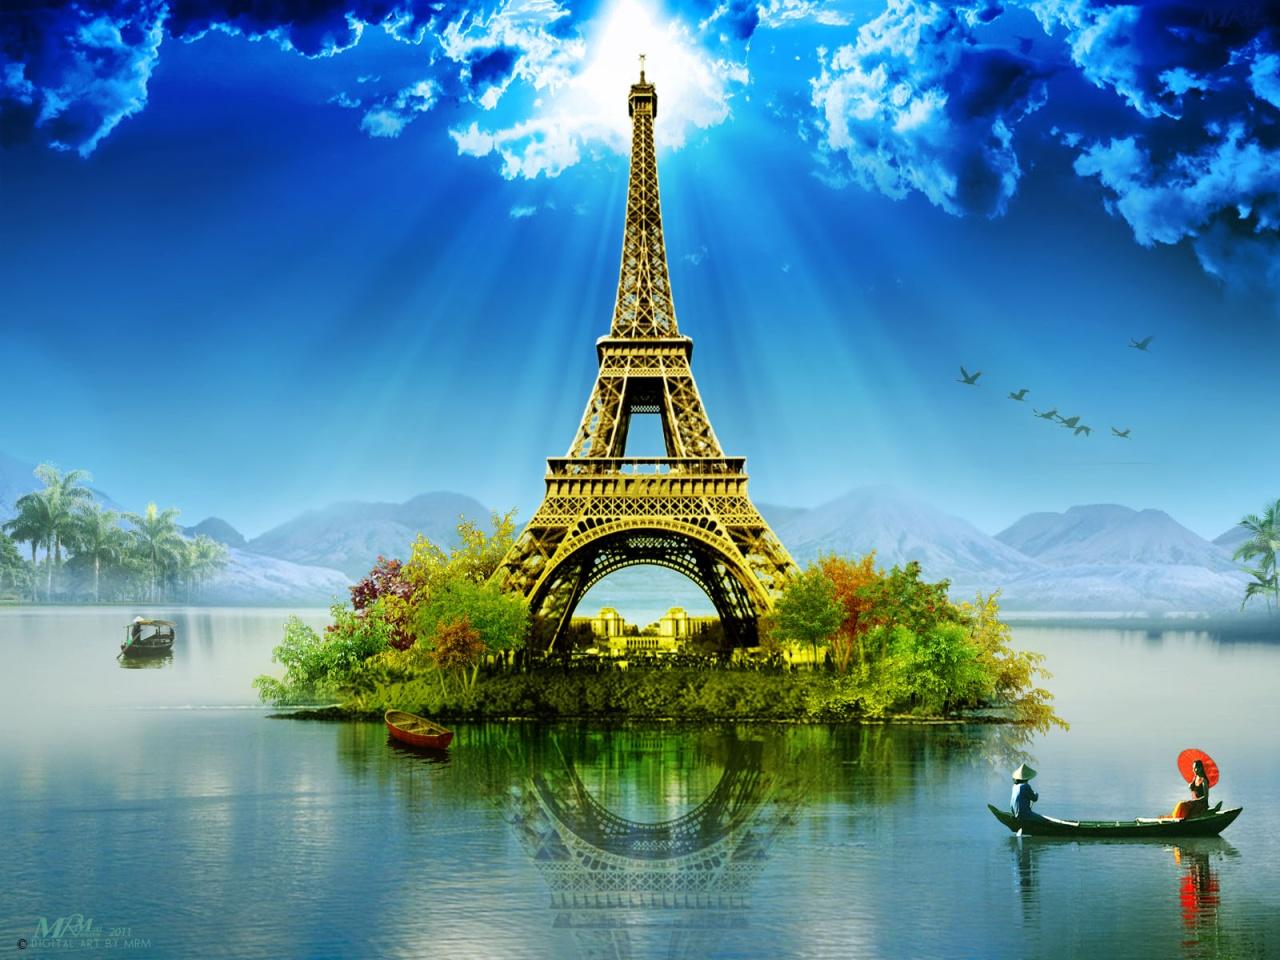 eiffel-tower-×-wallpaper-wpc5804544